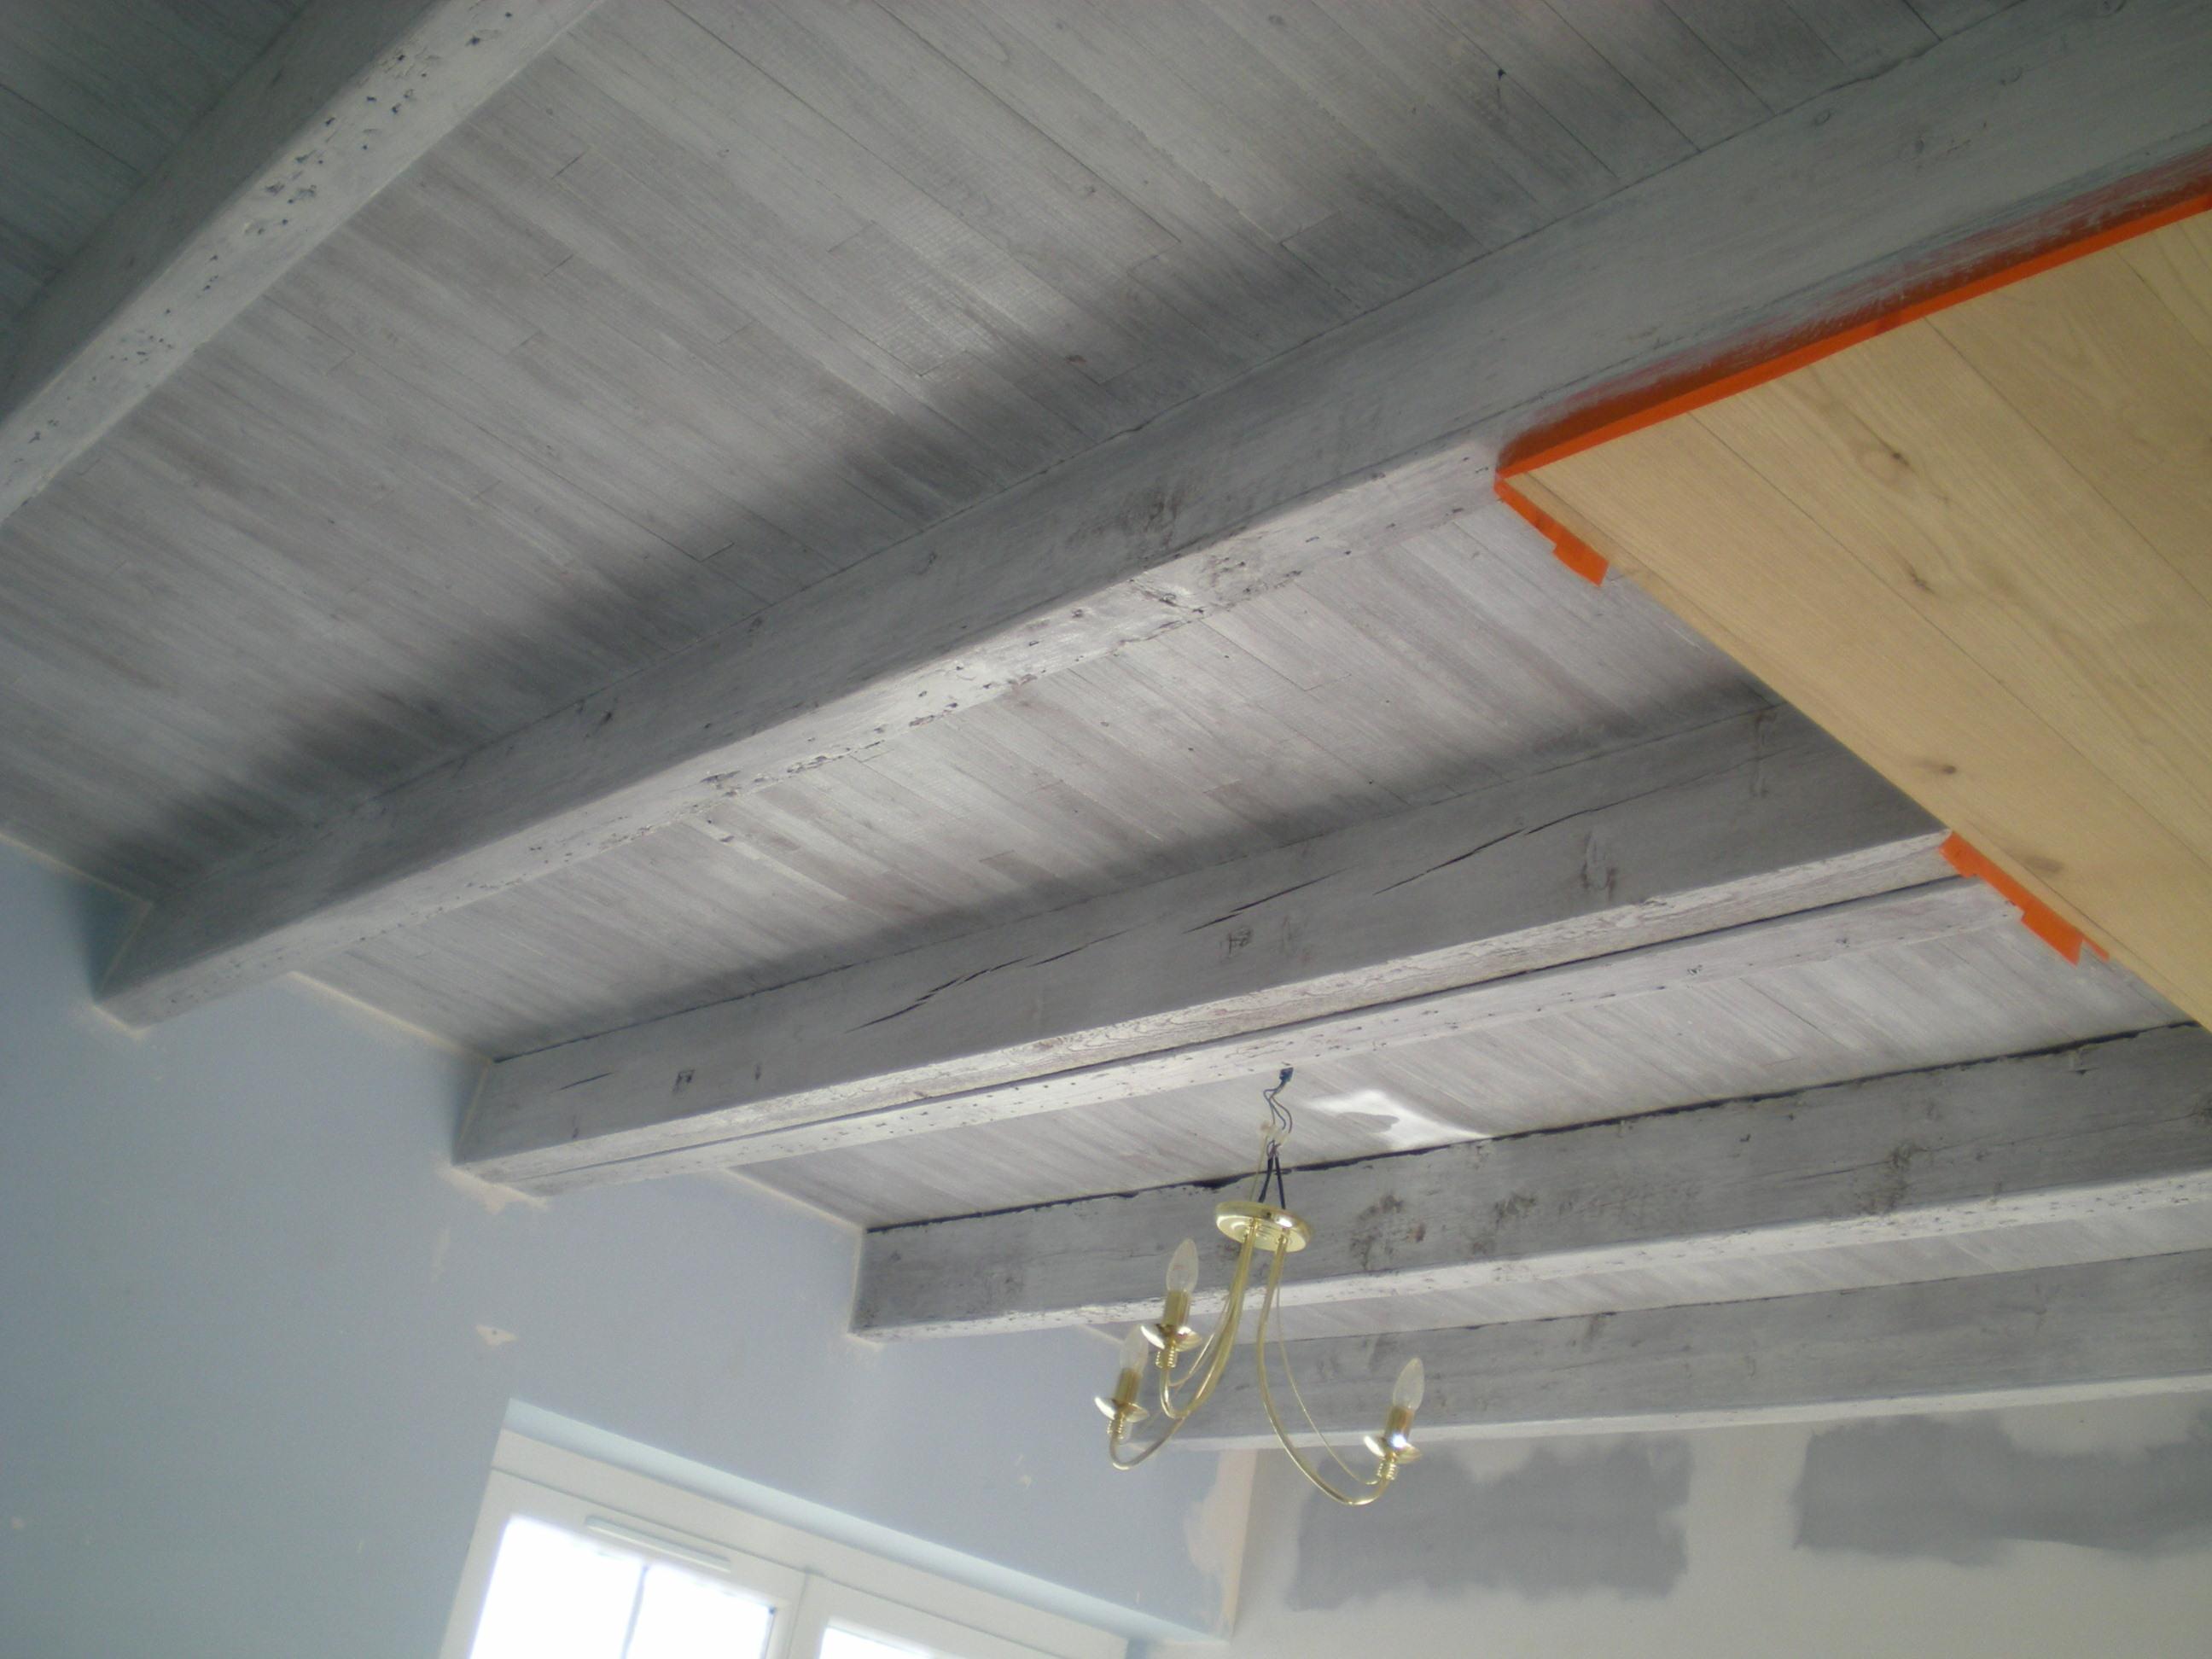 Cheap Eclaircir Poutre Plafond With Eclaircir Poutre Bois